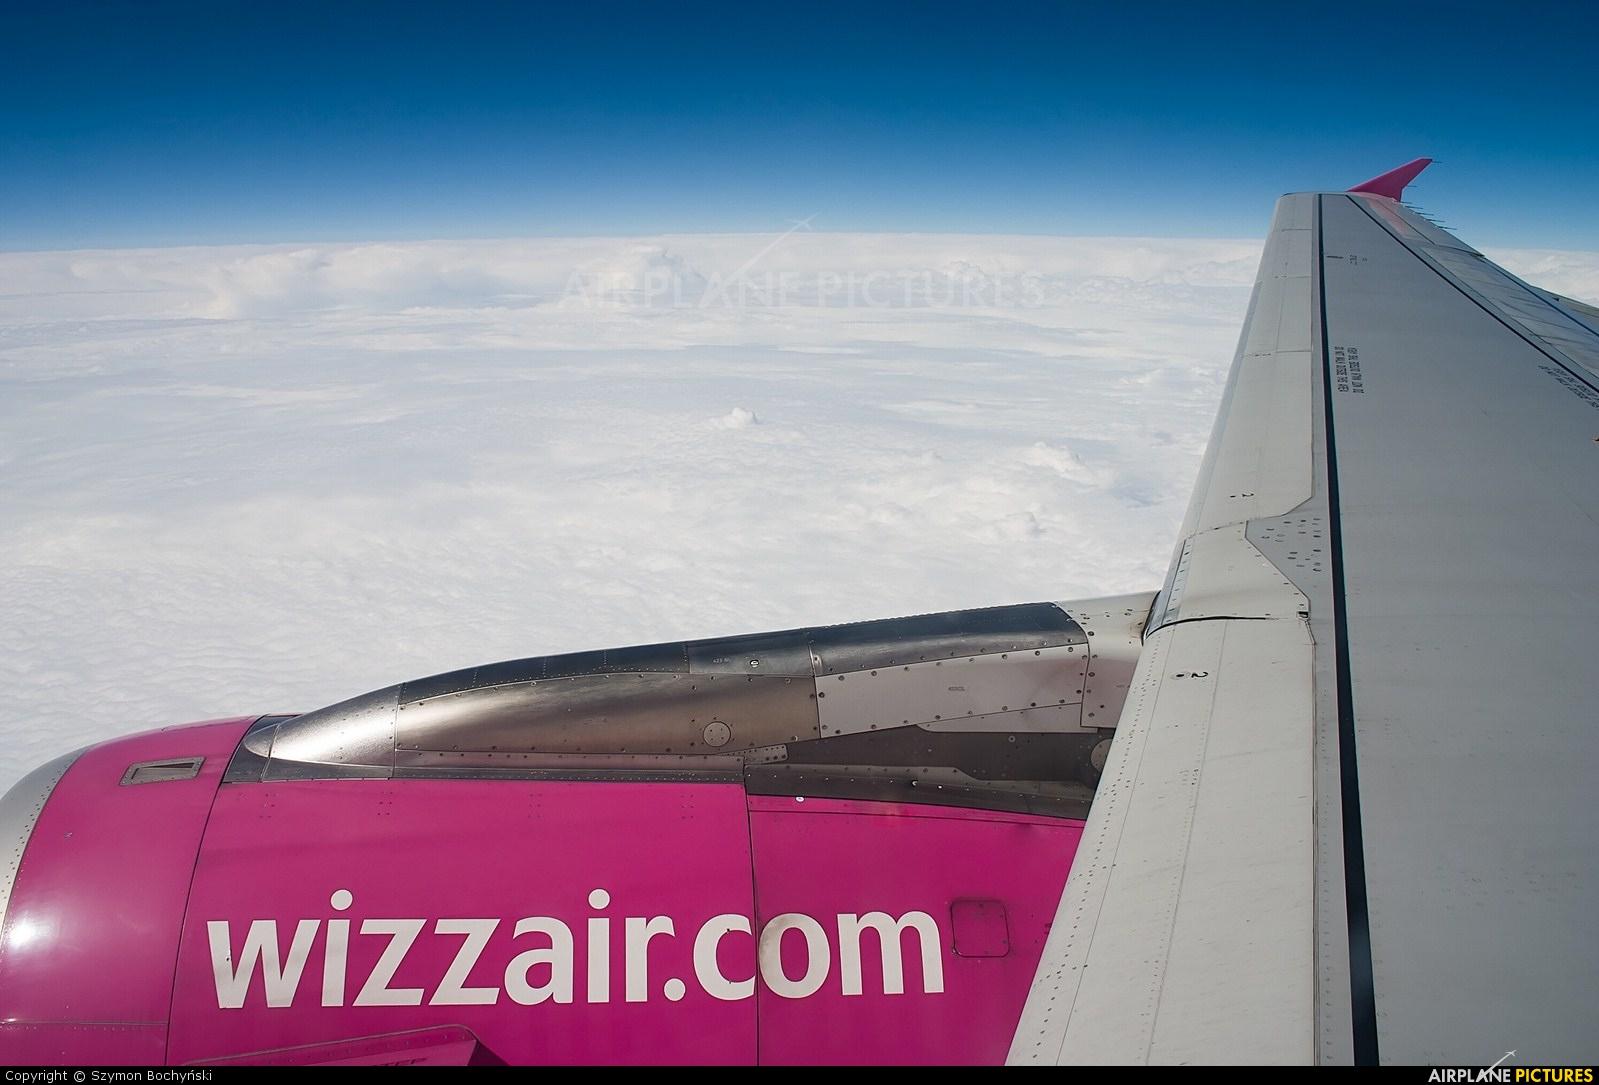 Wizz Air HA-LPN aircraft at In Flight - International